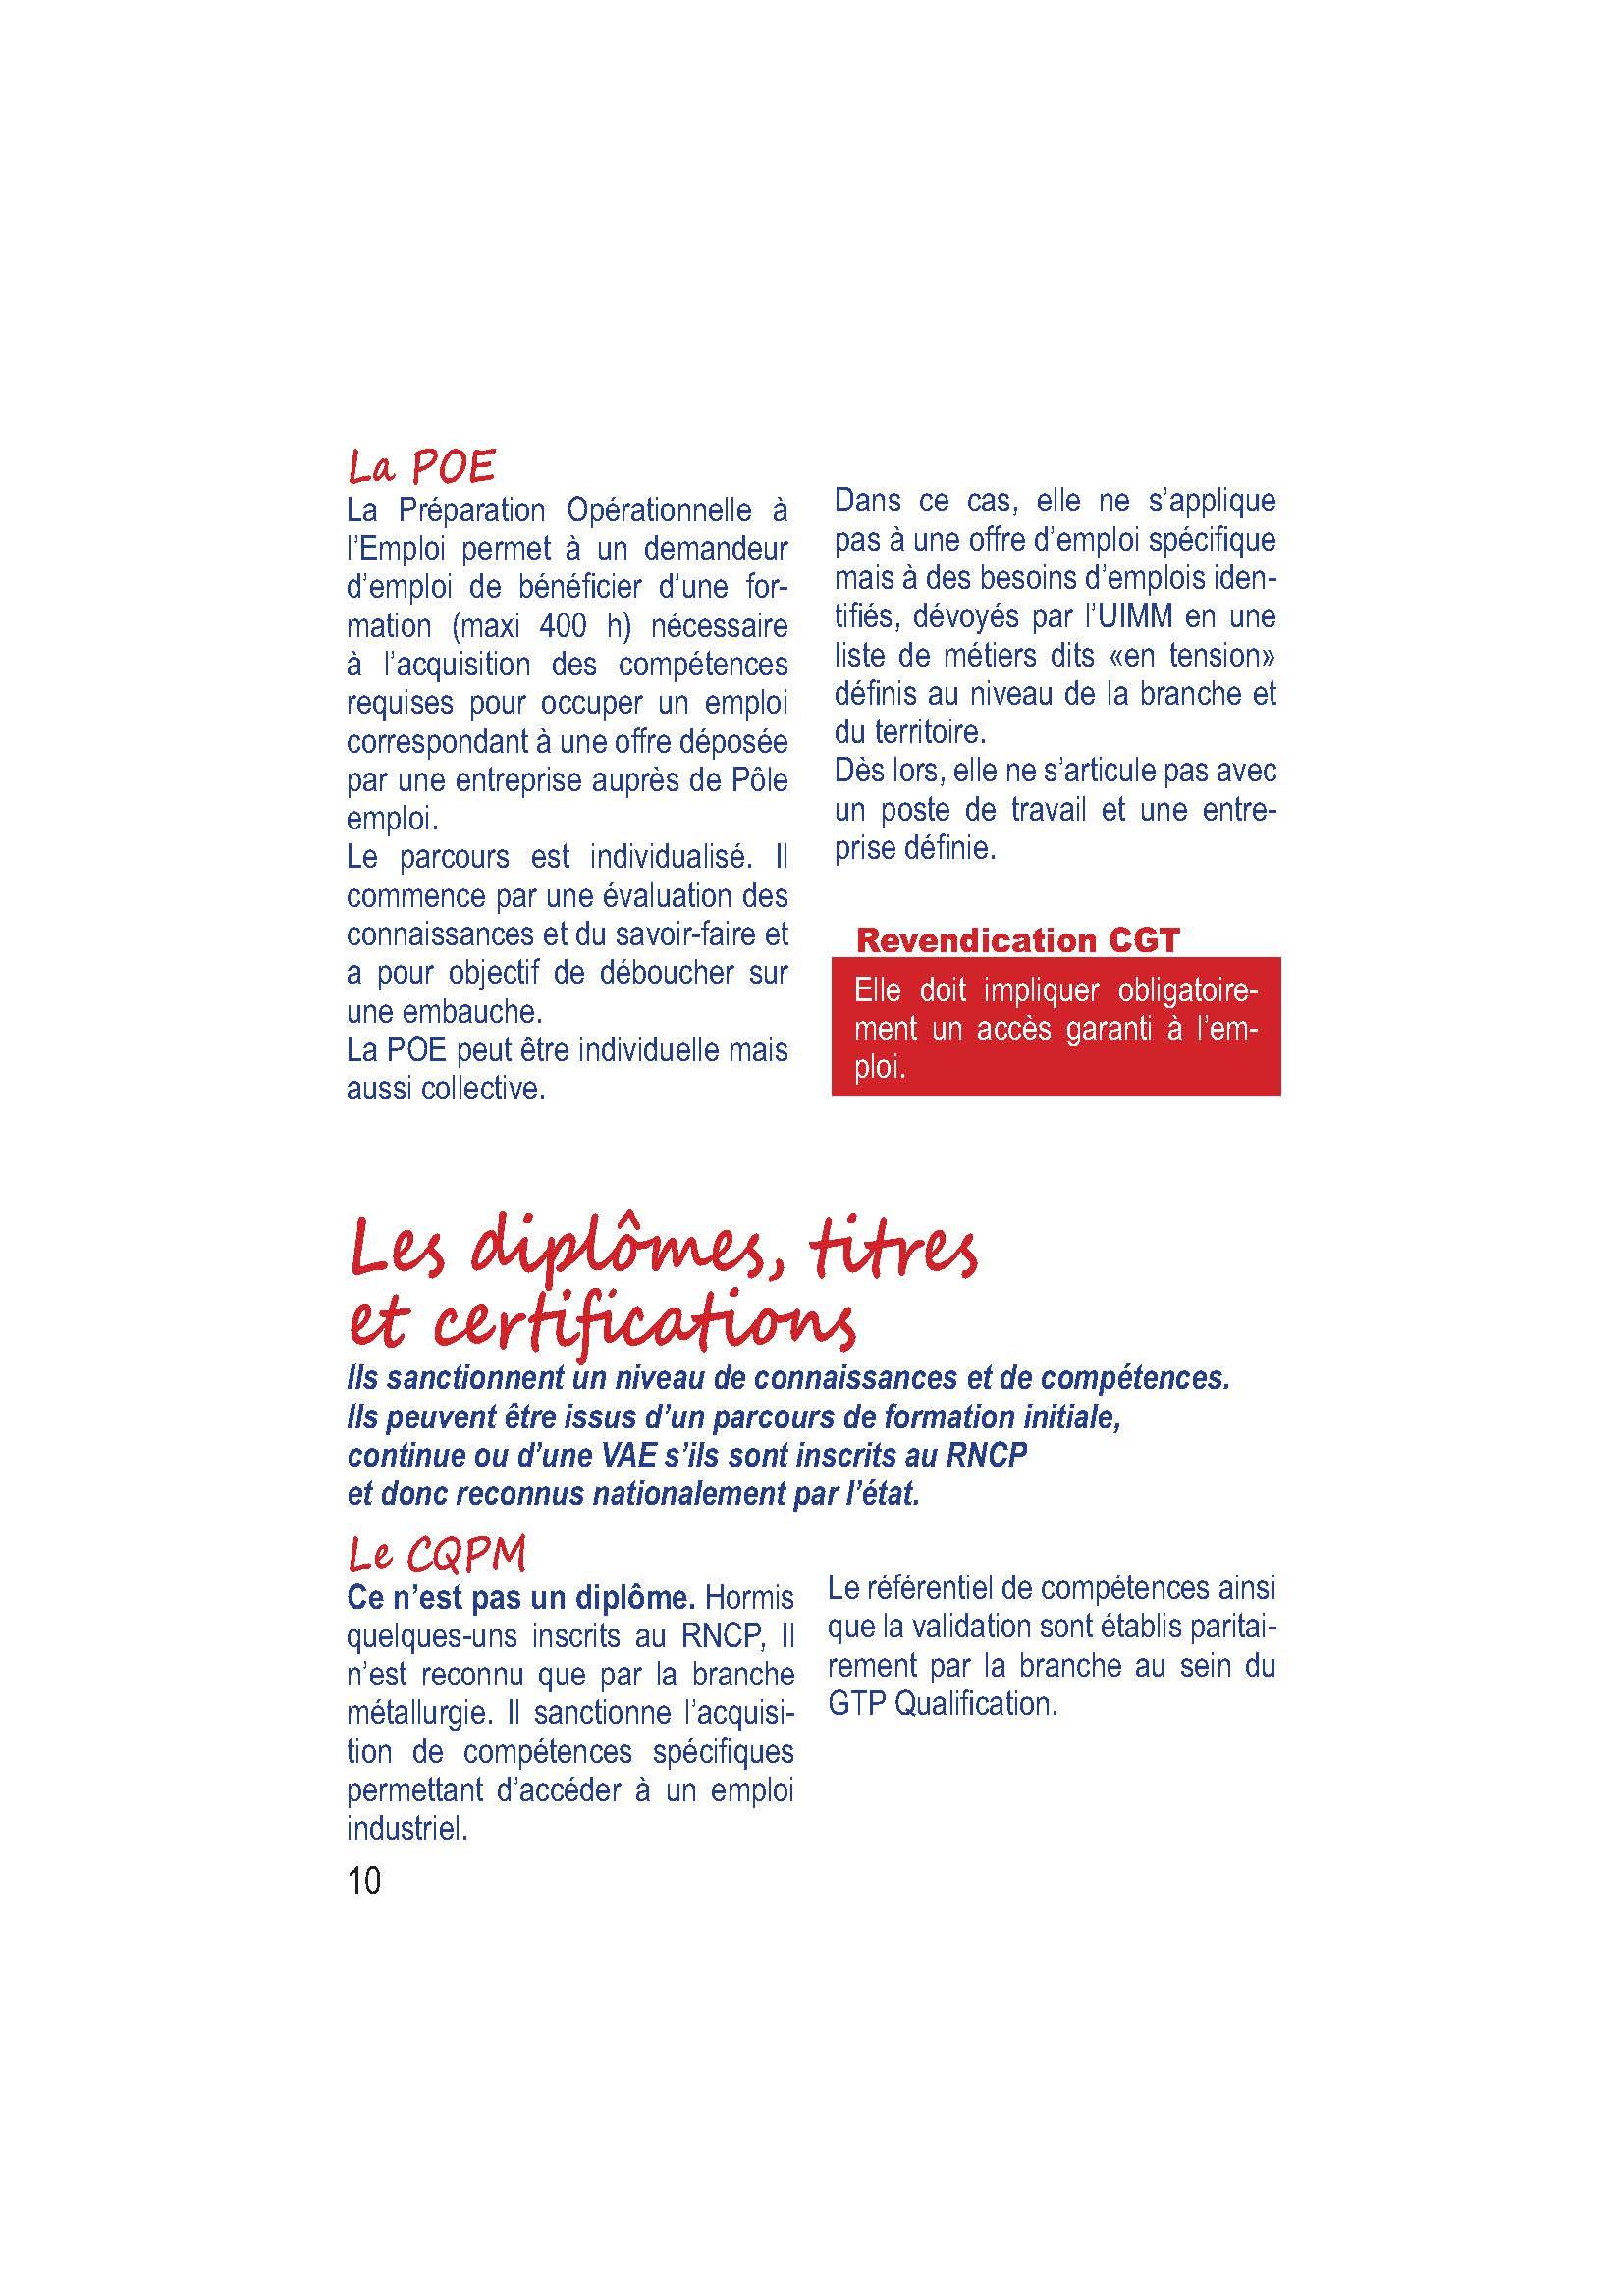 Livret Formation Professionelle_Page_10